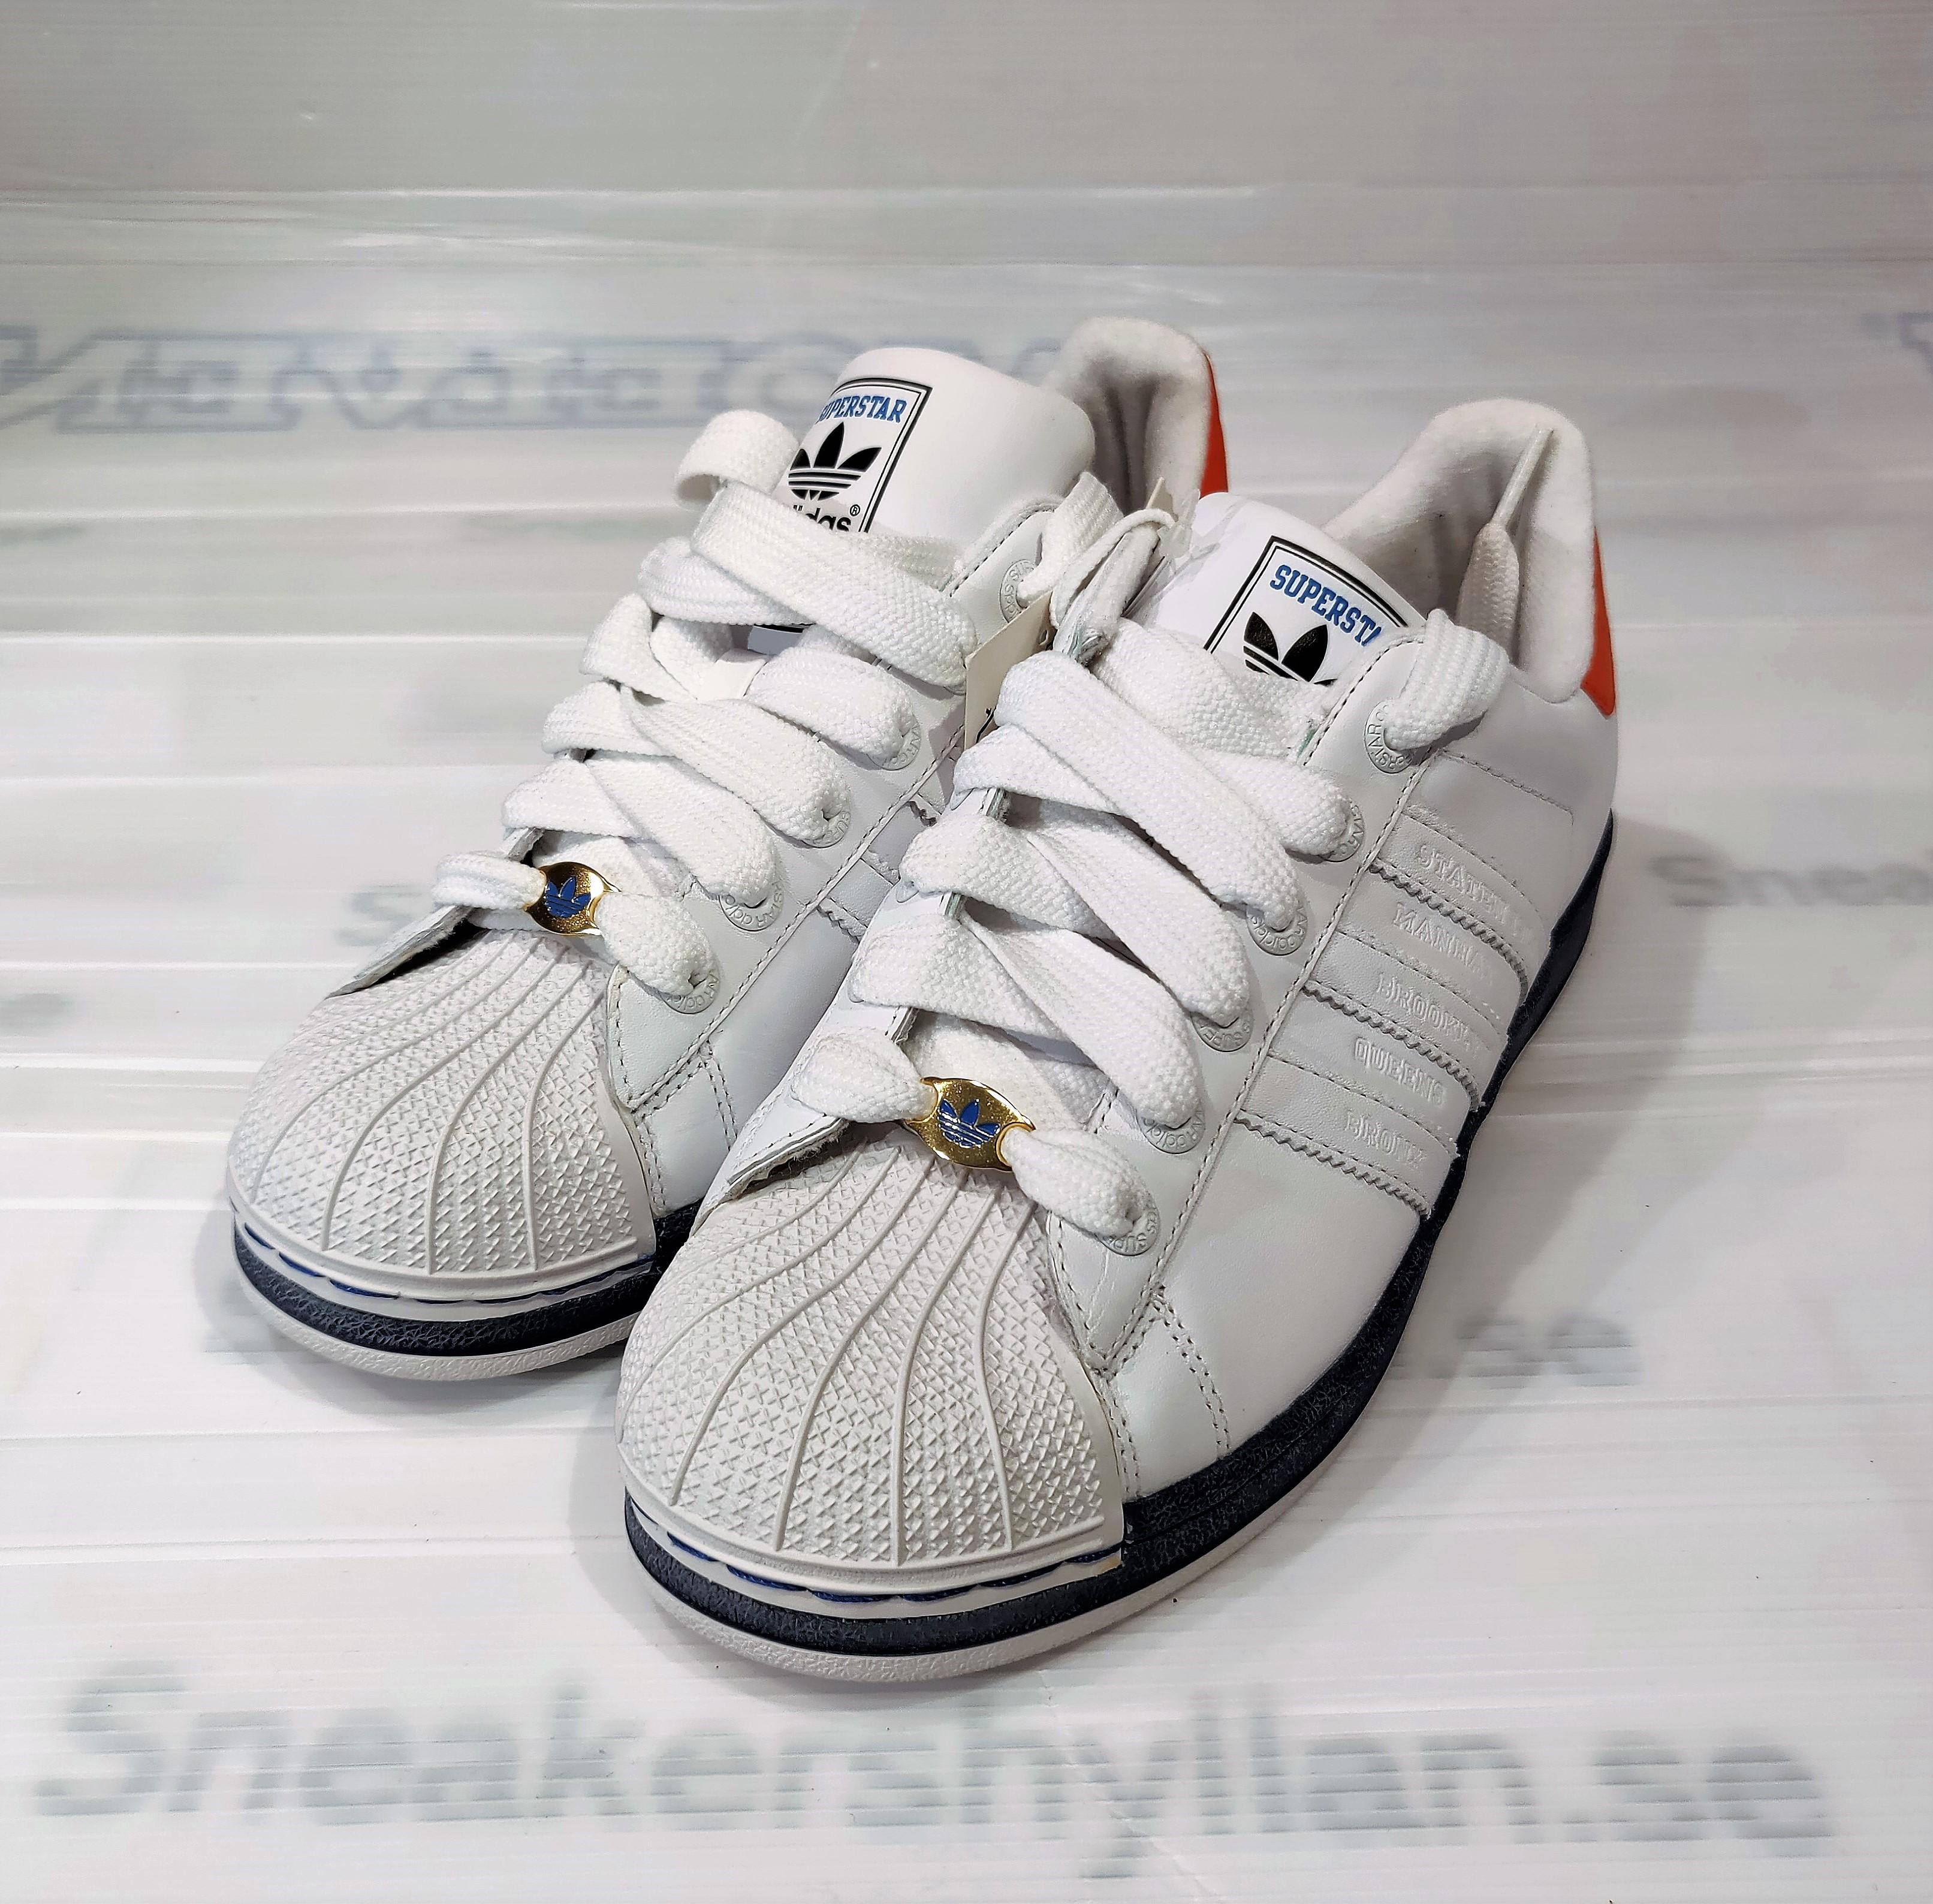 Adidas Superstar 2 City Version New York 35th